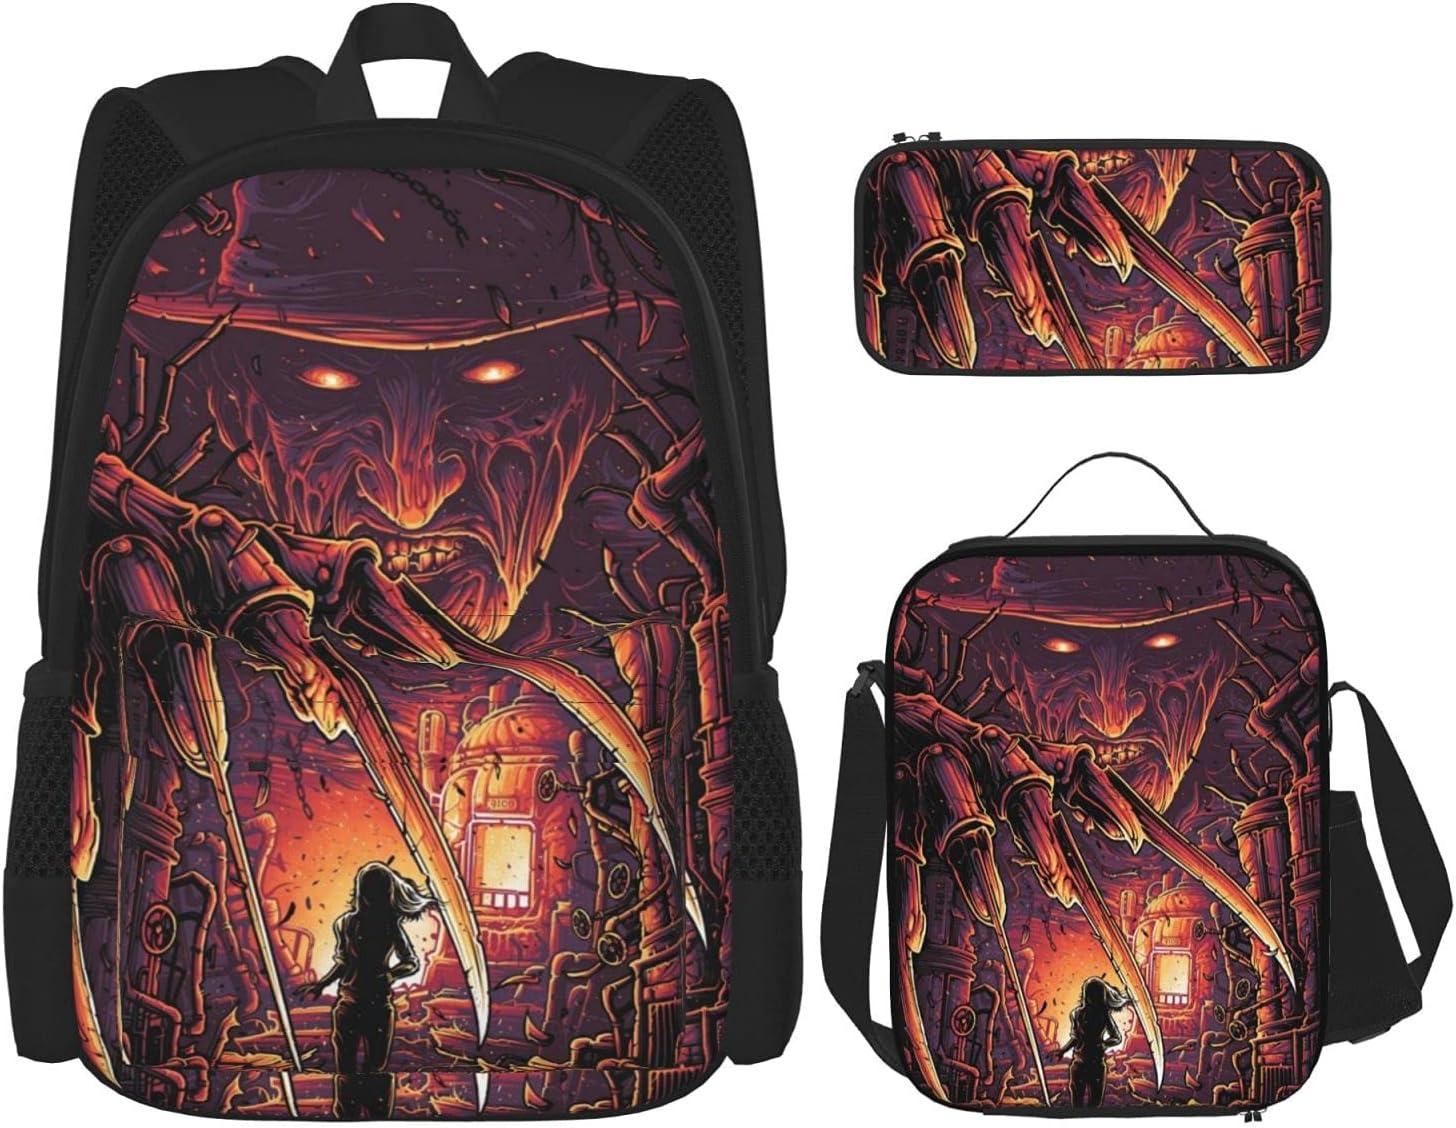 Freddy Krueger Anime 2021 fashione Backpack 2021new shipping free shipping + Pe Set 3-Piece